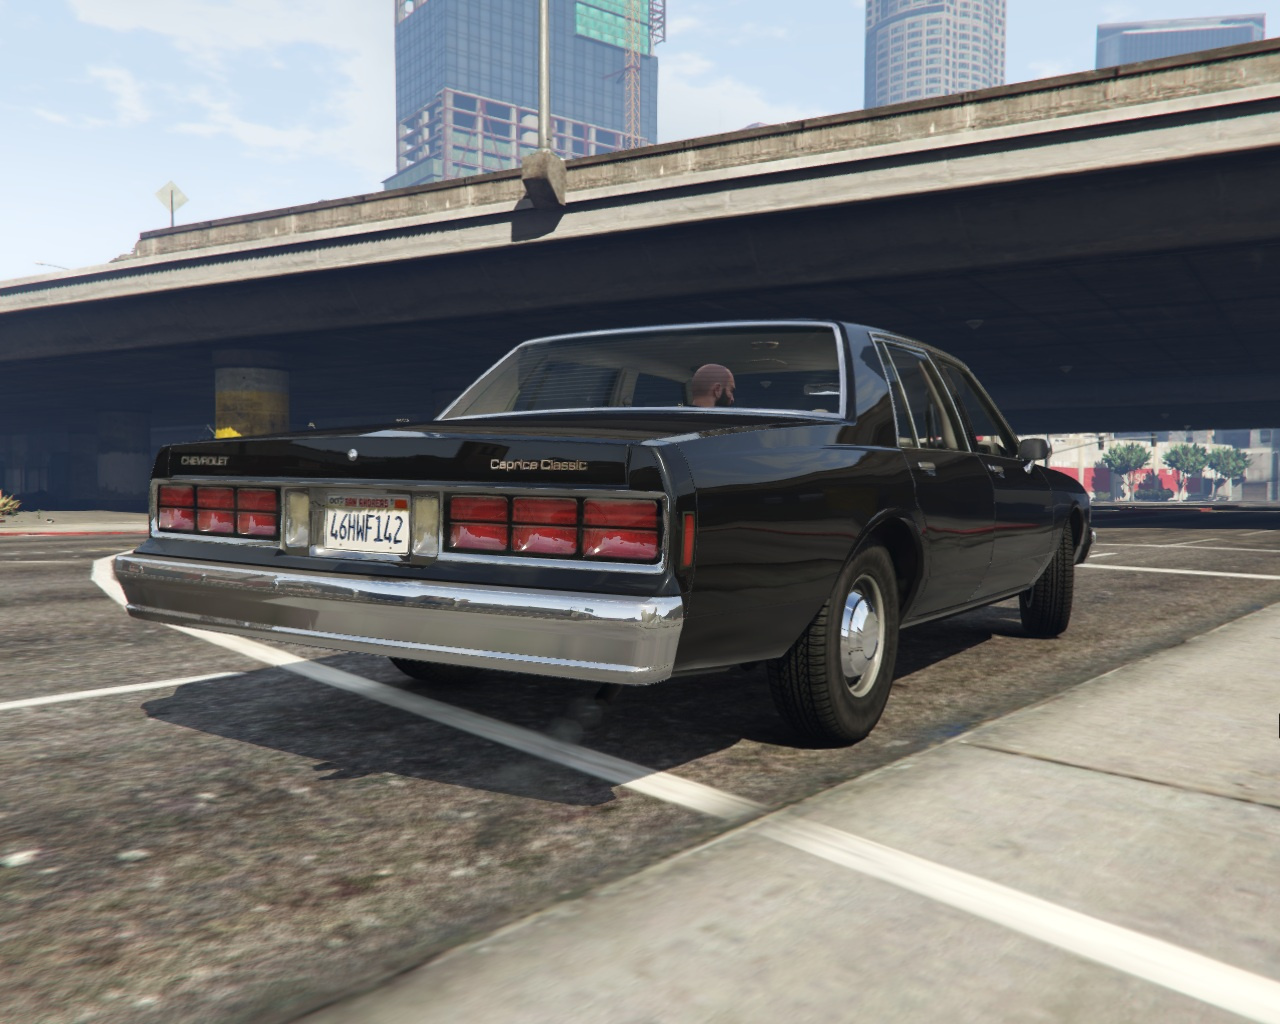 1989 Chevrolet Caprice Sedan Add On Replace 1966 Chevy Wagon 230ace Gta5 2016 07 14 06 52 54 67